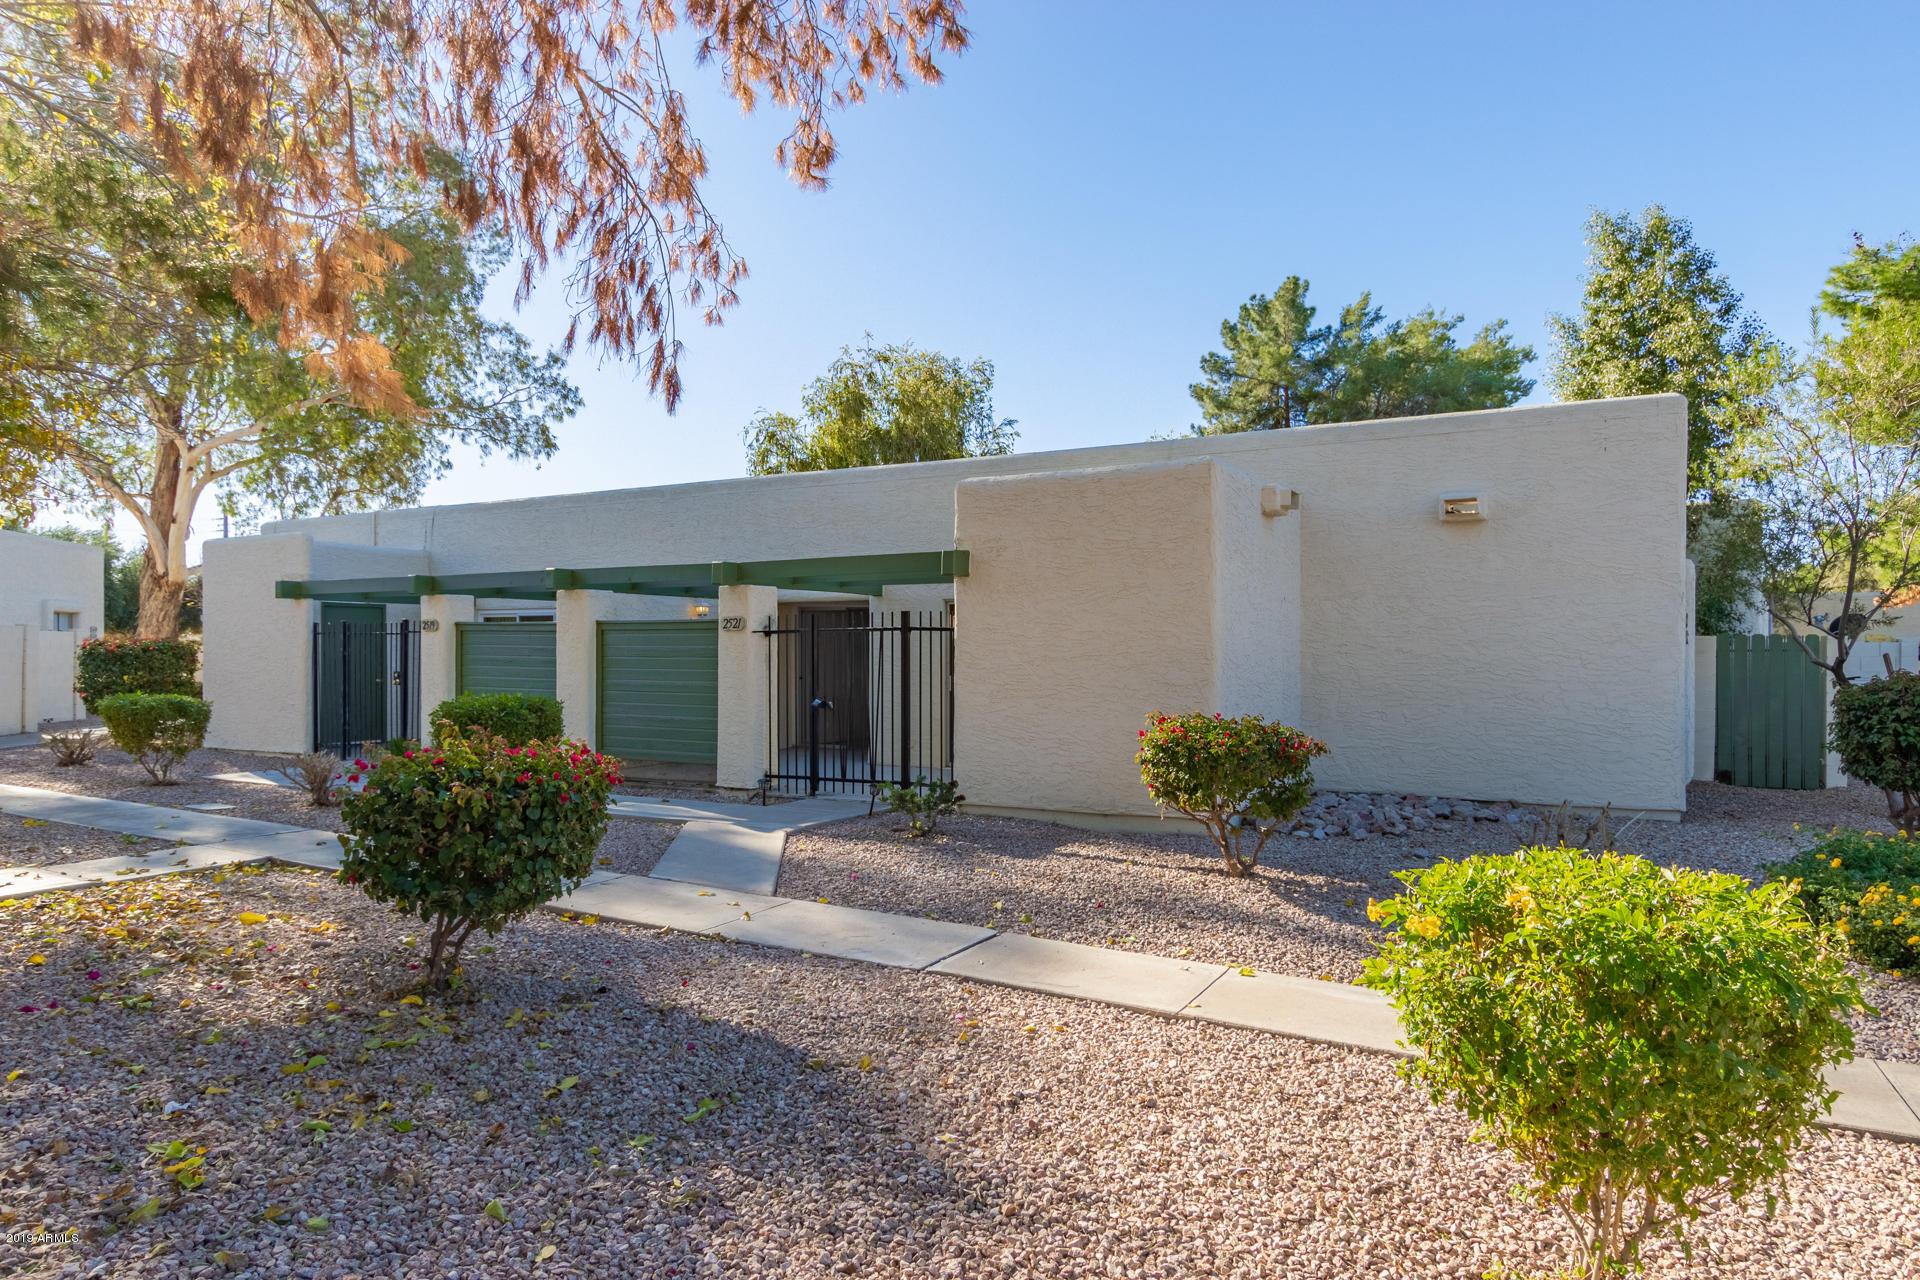 Photo of 2521 E 6TH Street, Tempe, AZ 85281